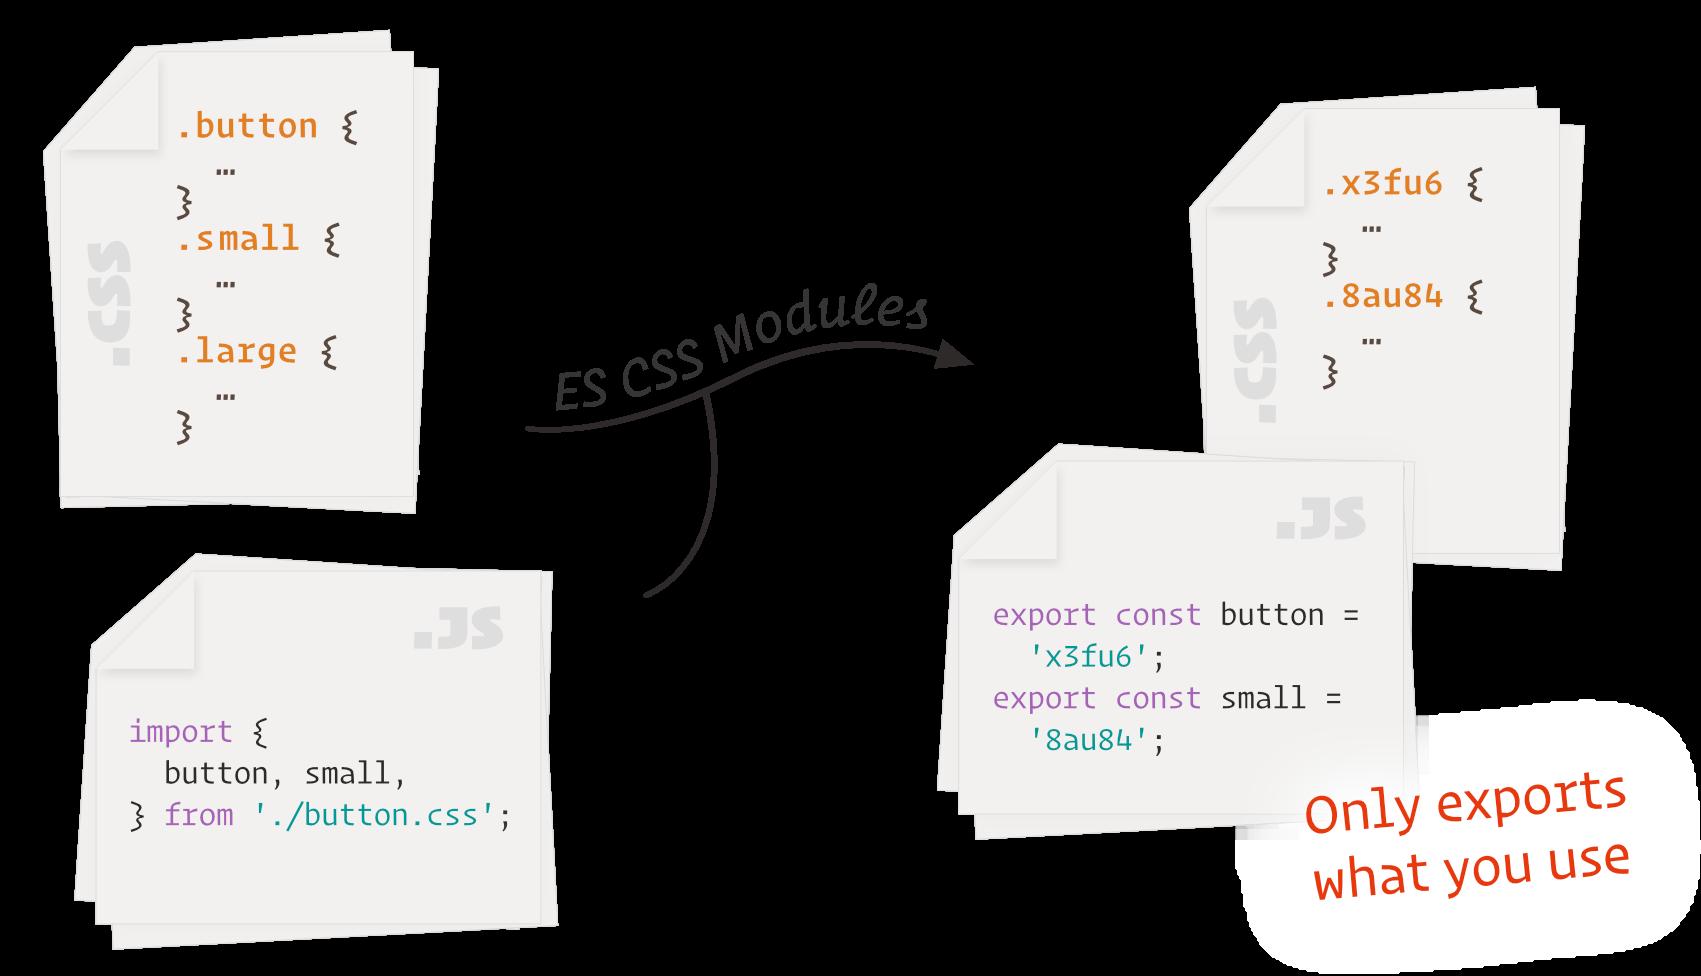 ES CSS Modules demo